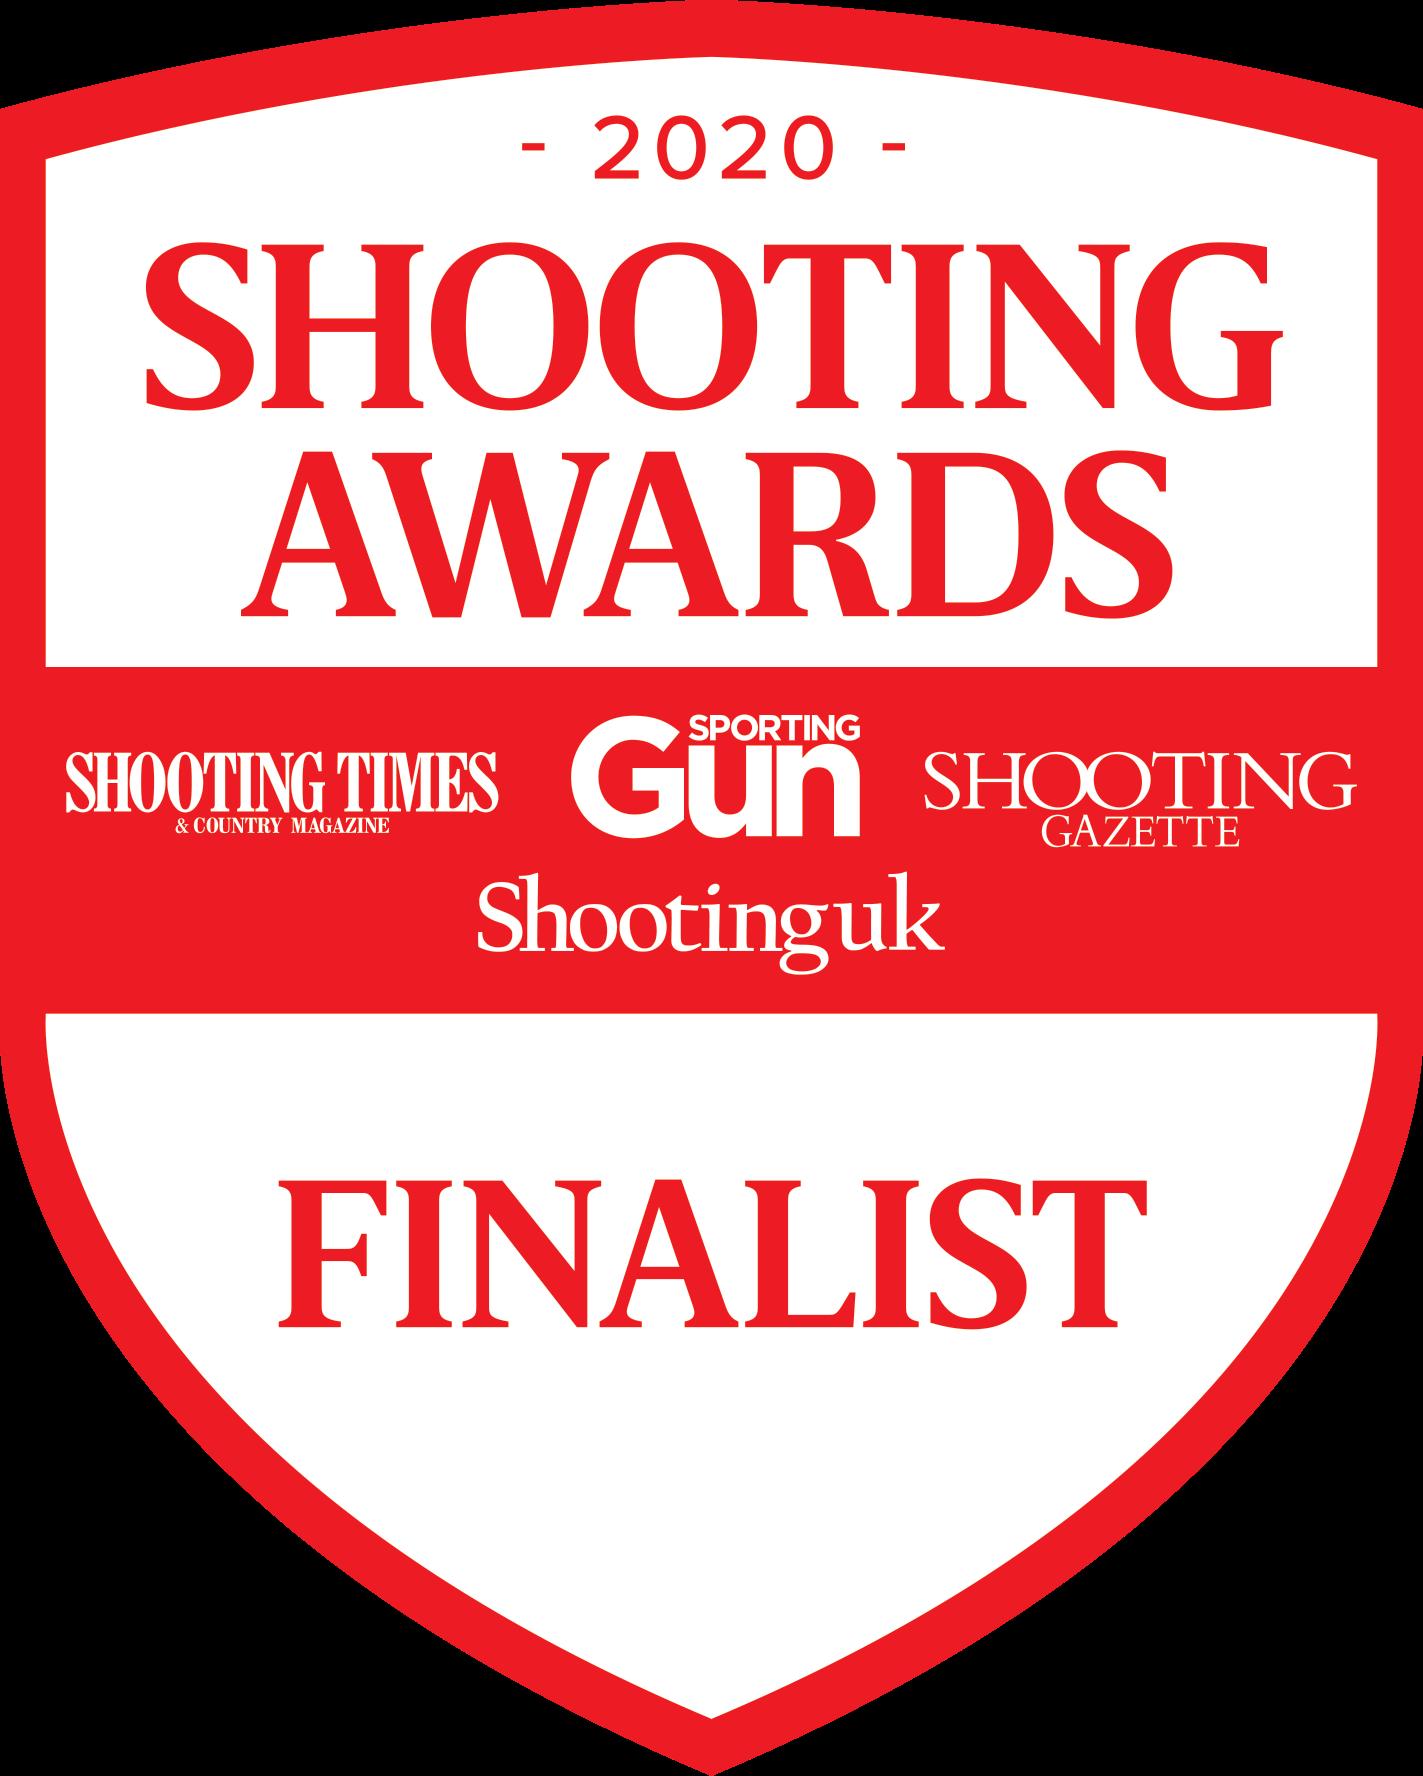 2020 Shooting Awards!